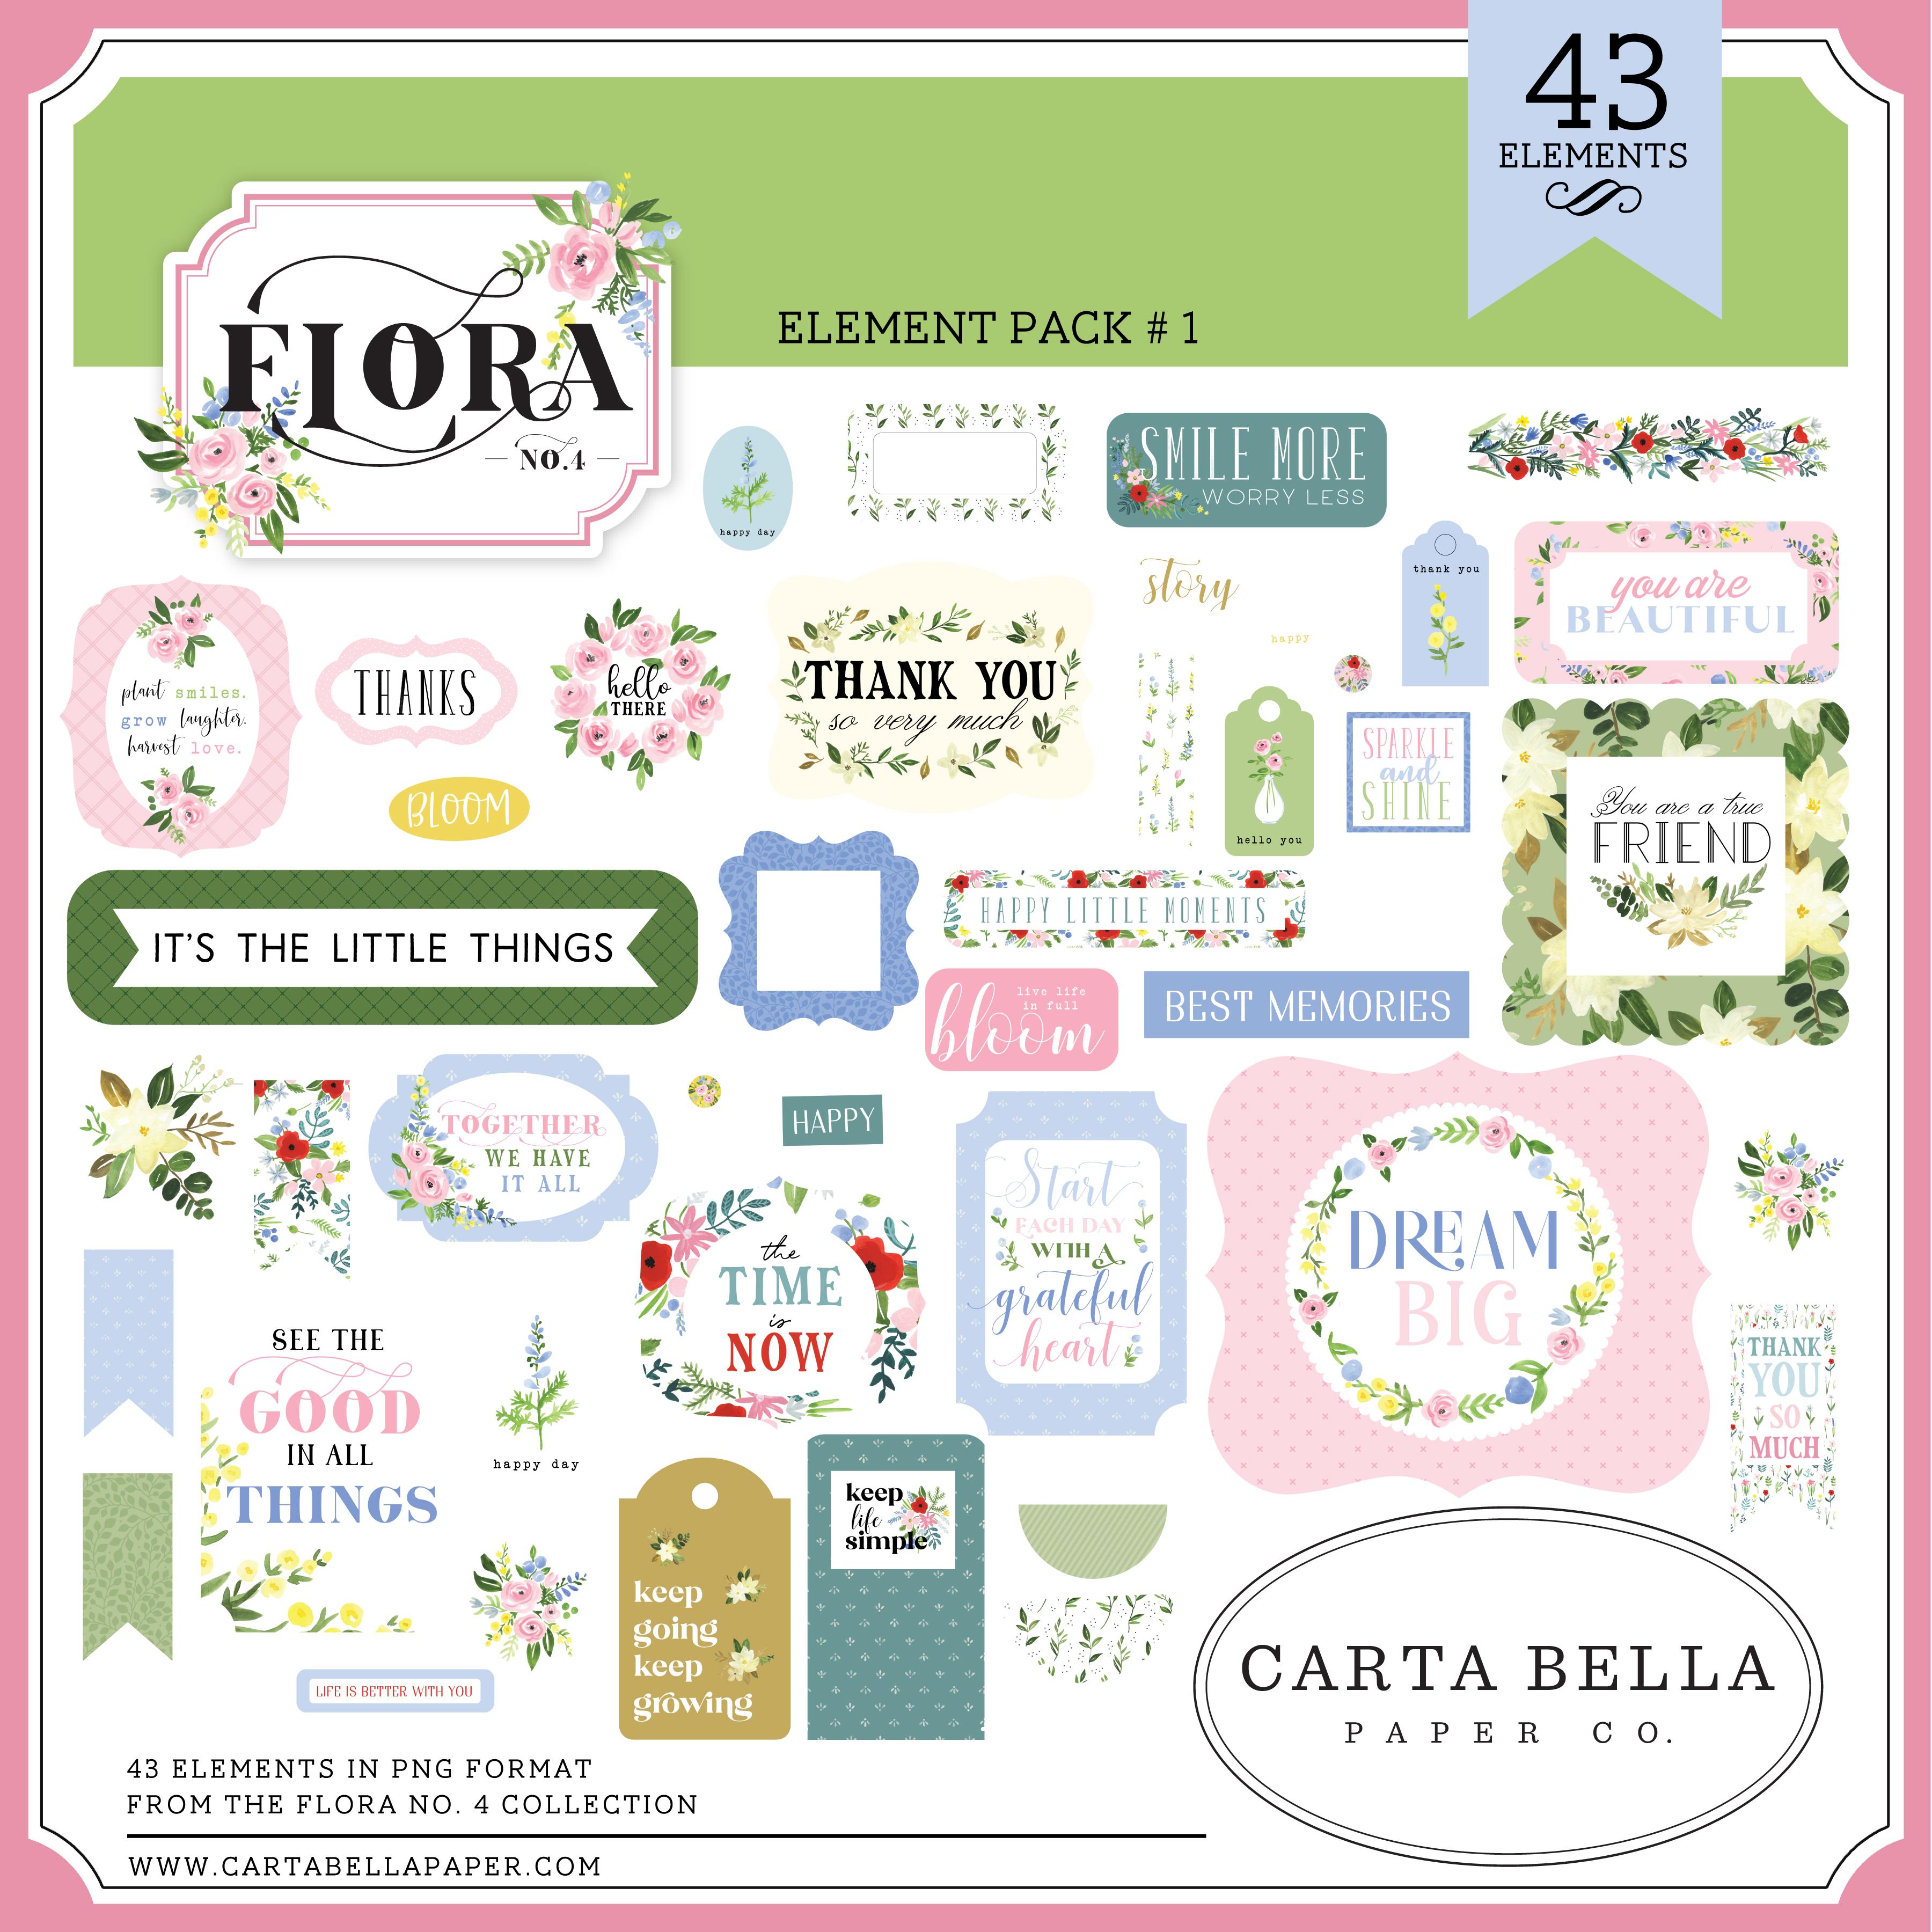 Flora No. 4 Element Pack #1